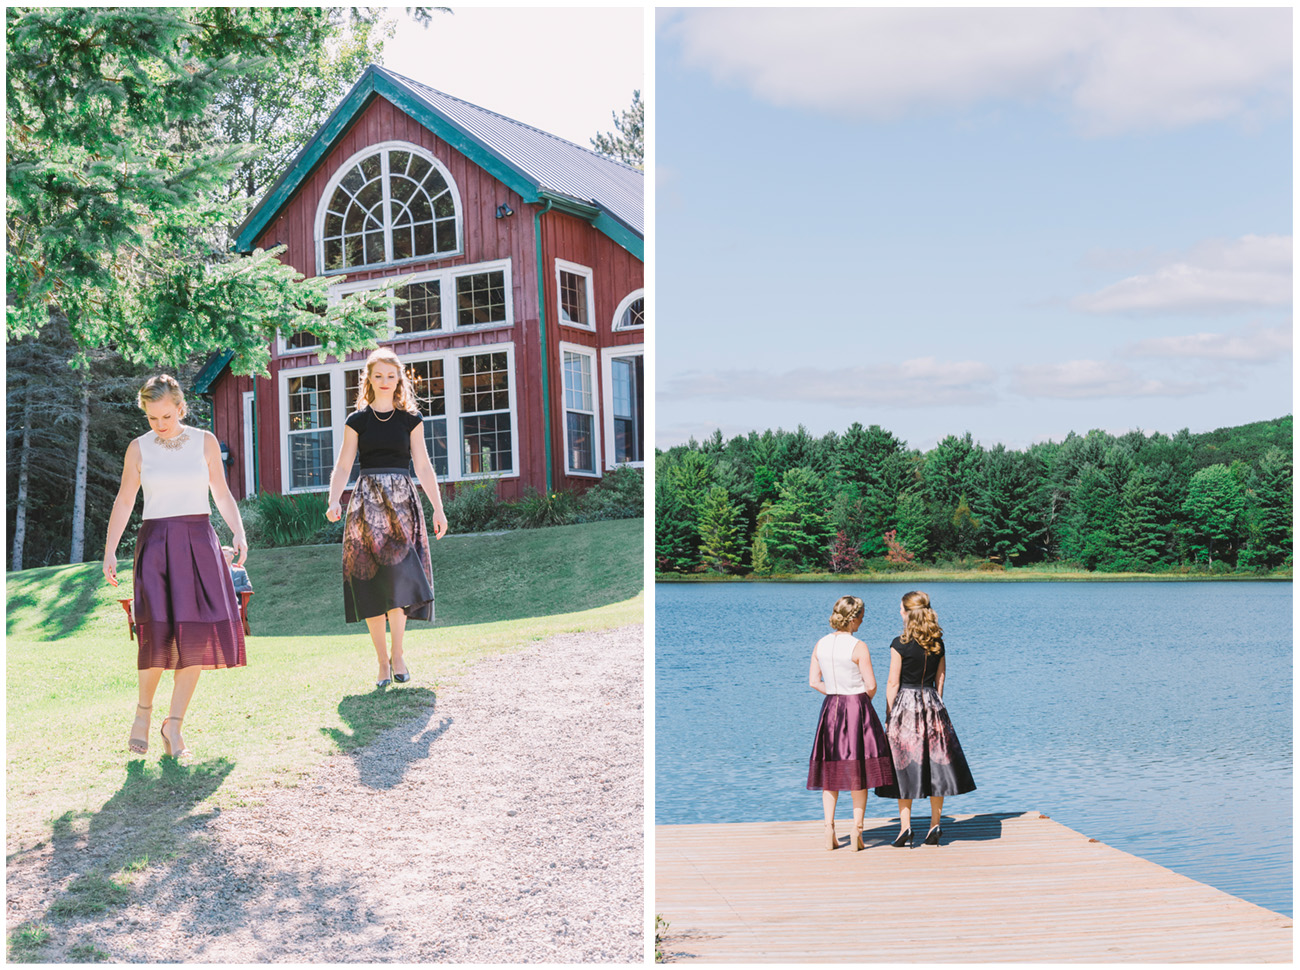 Wedding Photos at Trillium Resort and Spa